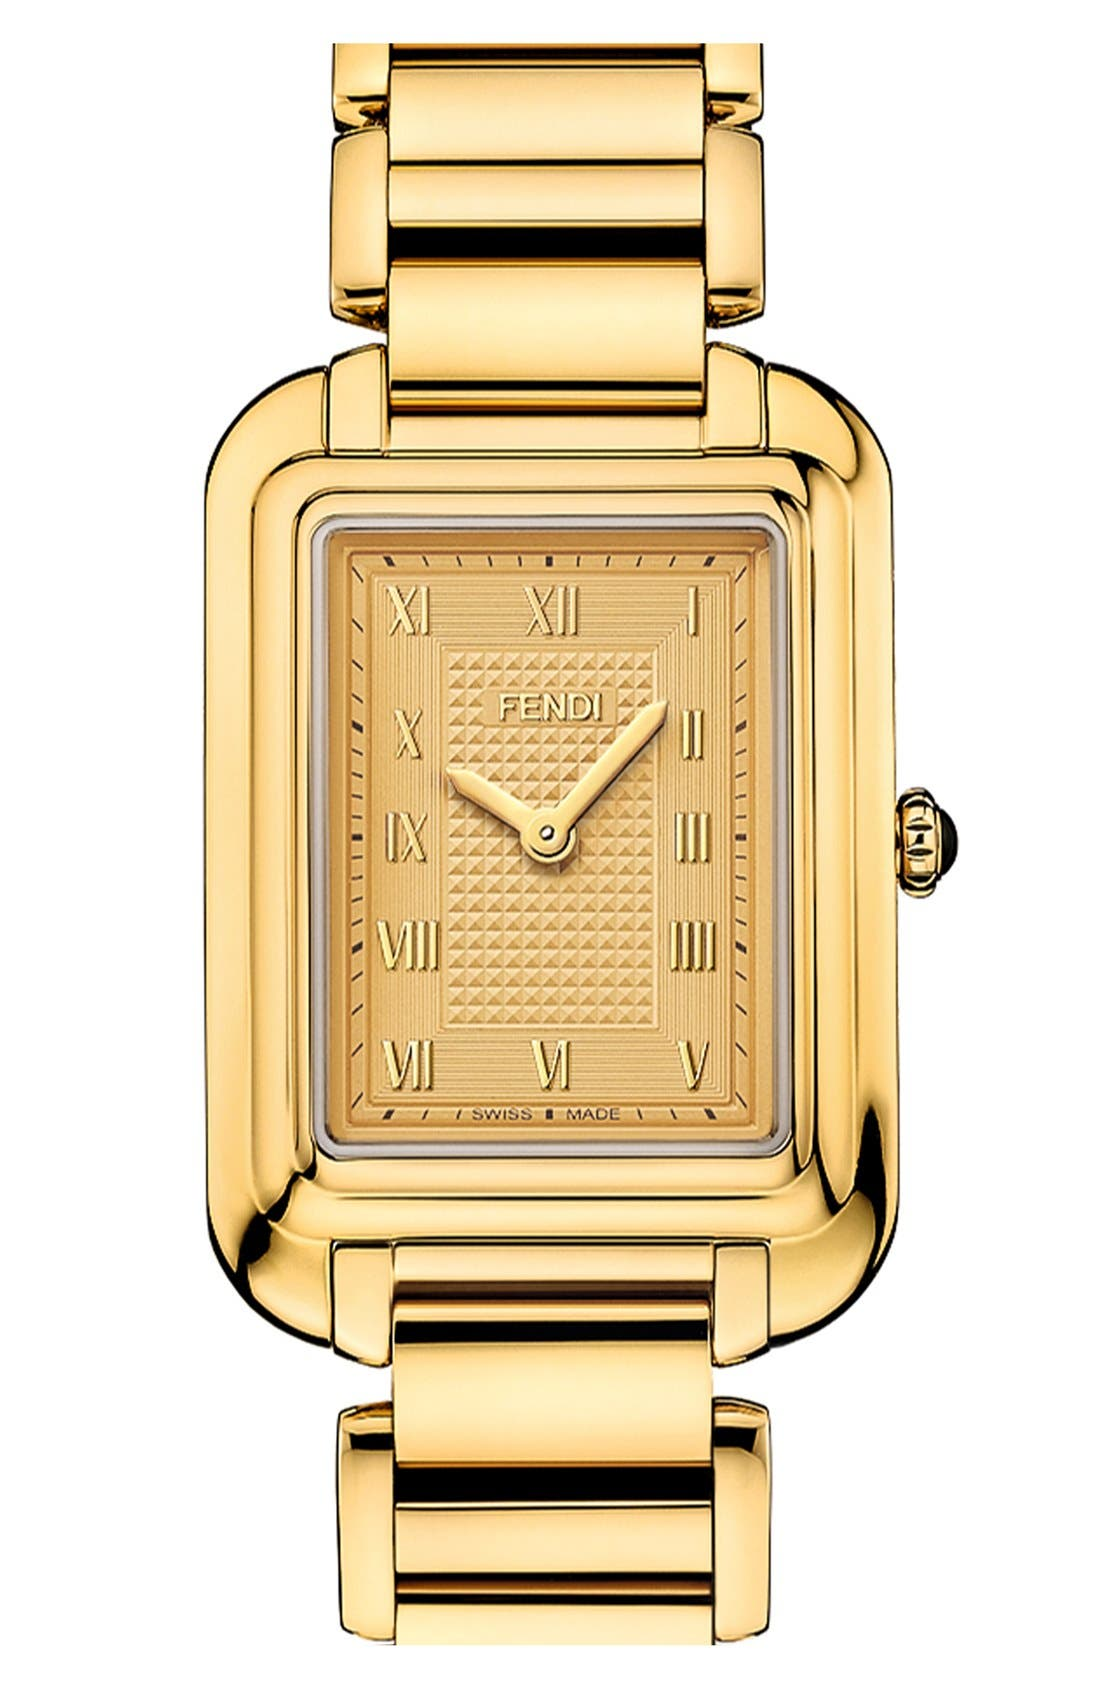 Alternate Image 1 Selected - Fendi 'Classico' Rectangular Bracelet Watch, 25mm x 36mm